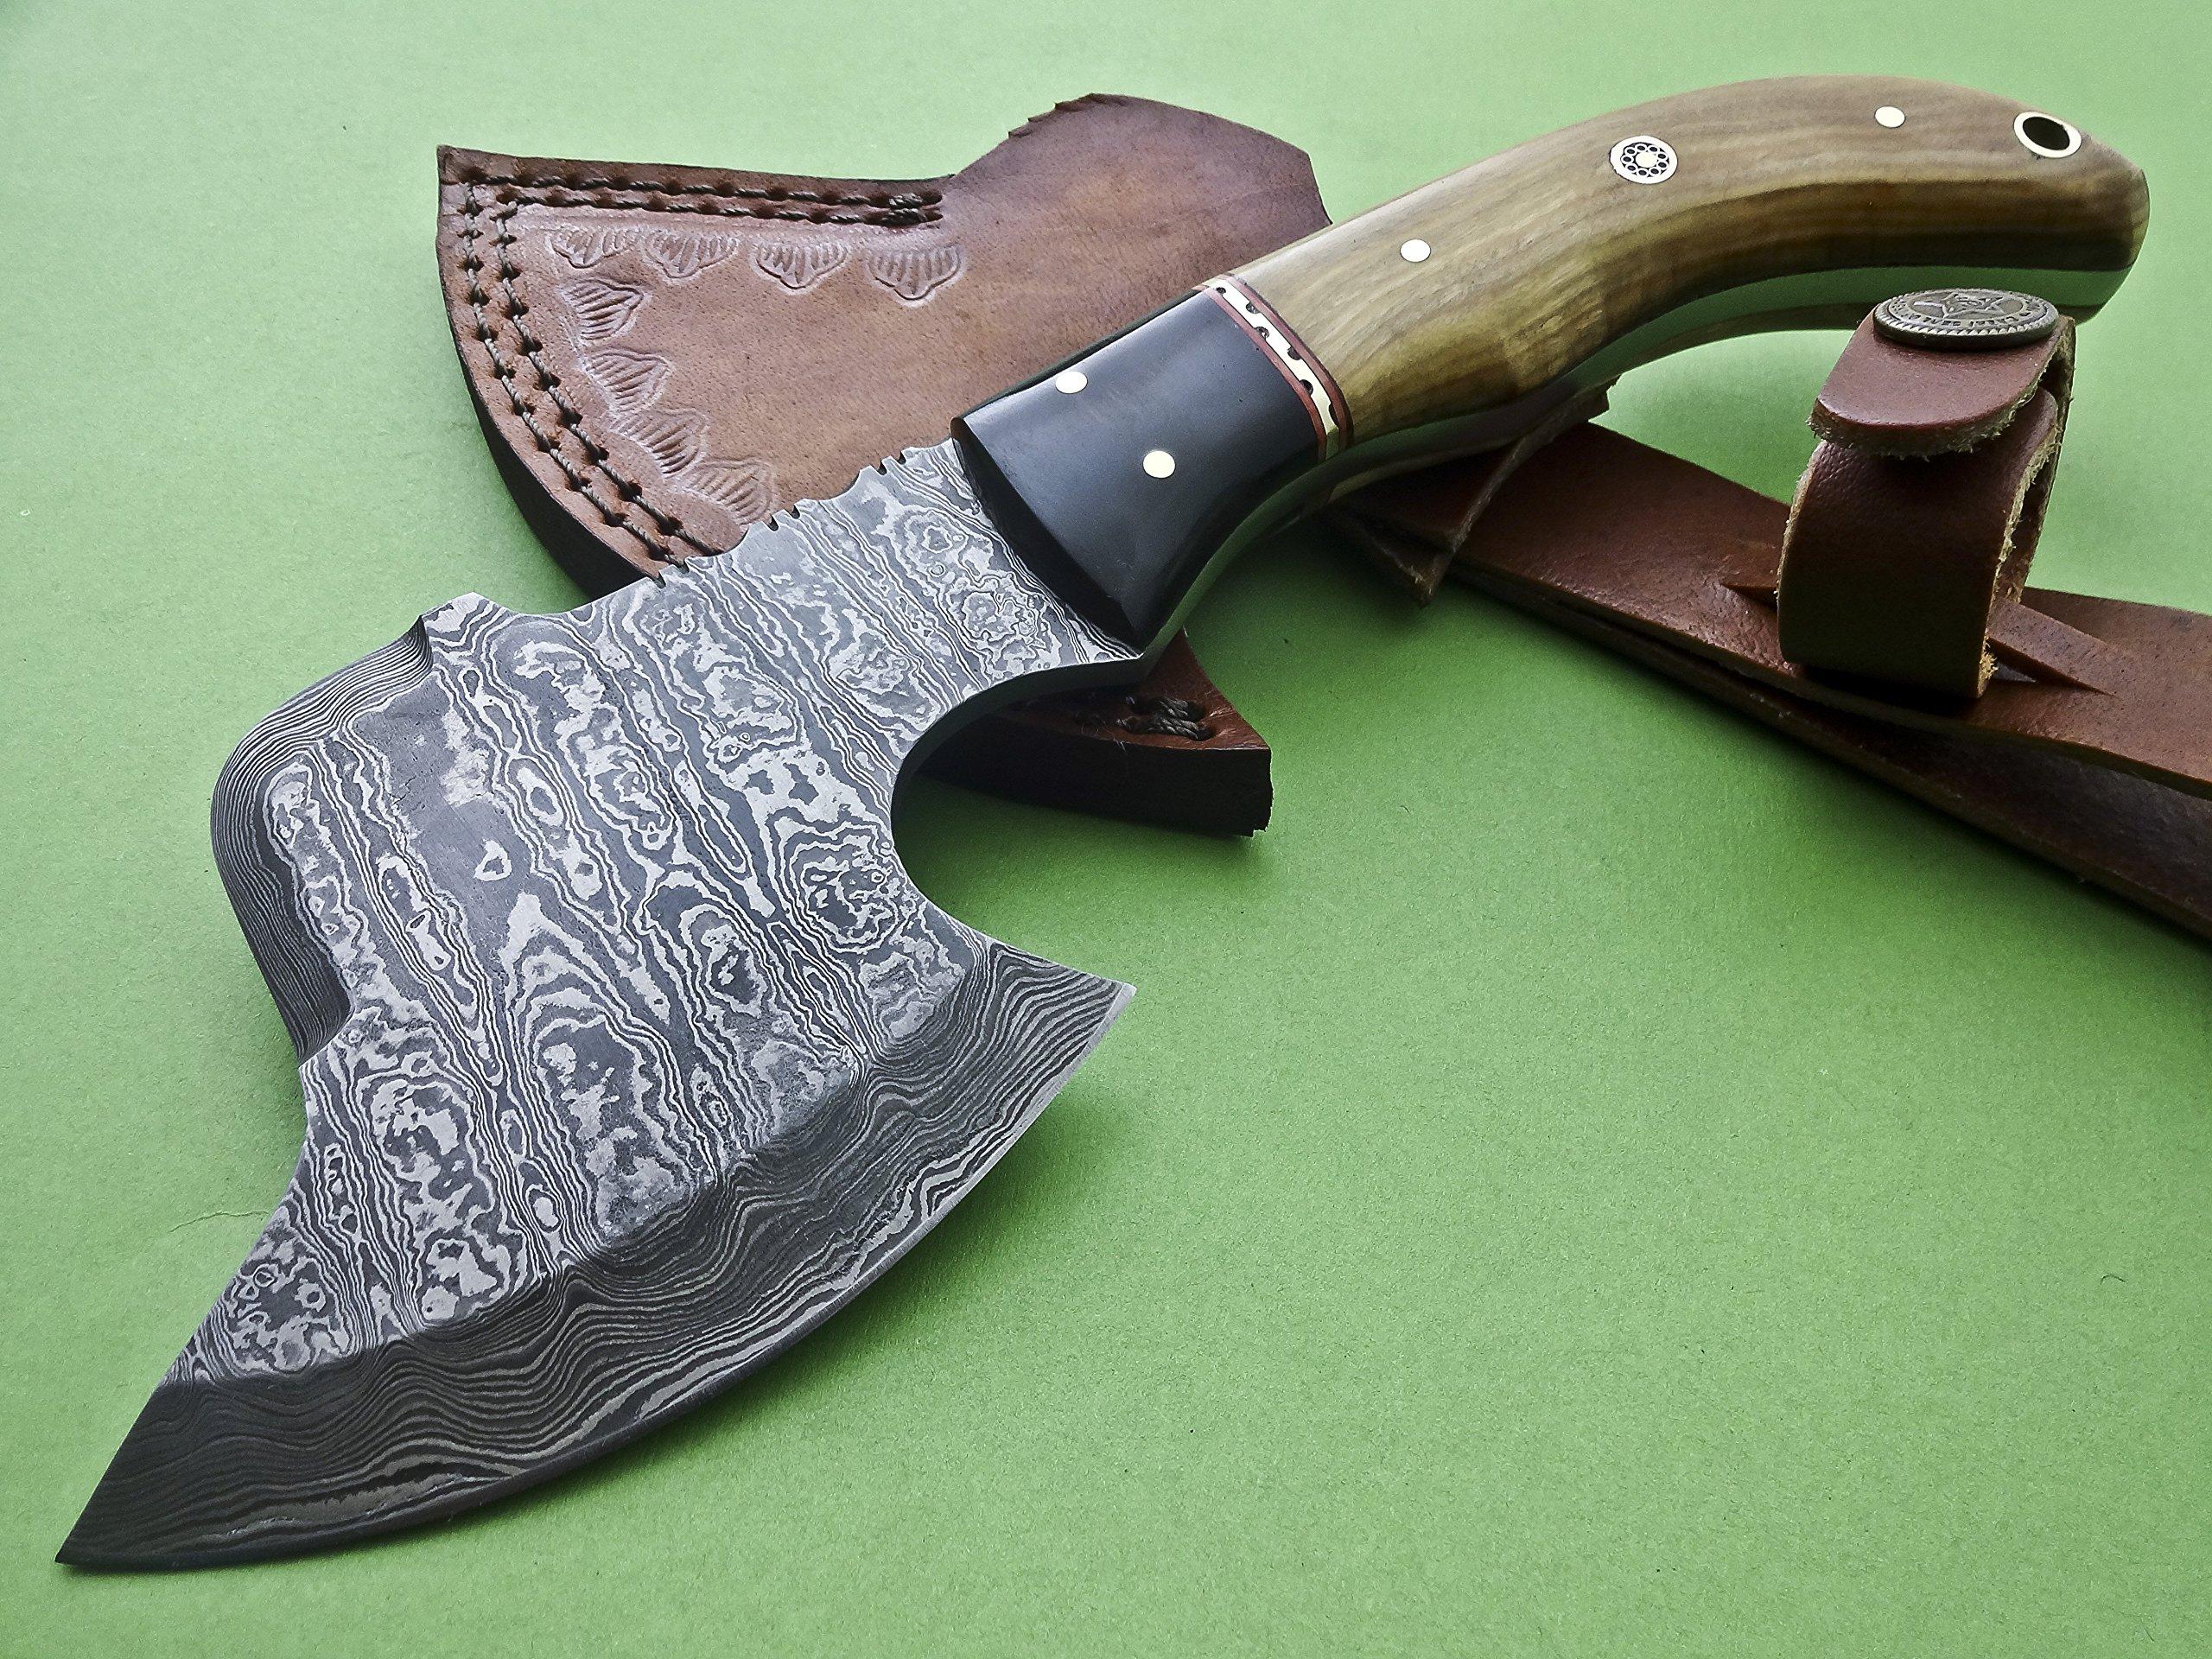 Ax-H-001,Custom Handmade Damascus Steel 9 Inches Axe - Exotic Wood and Bull Horn Handle